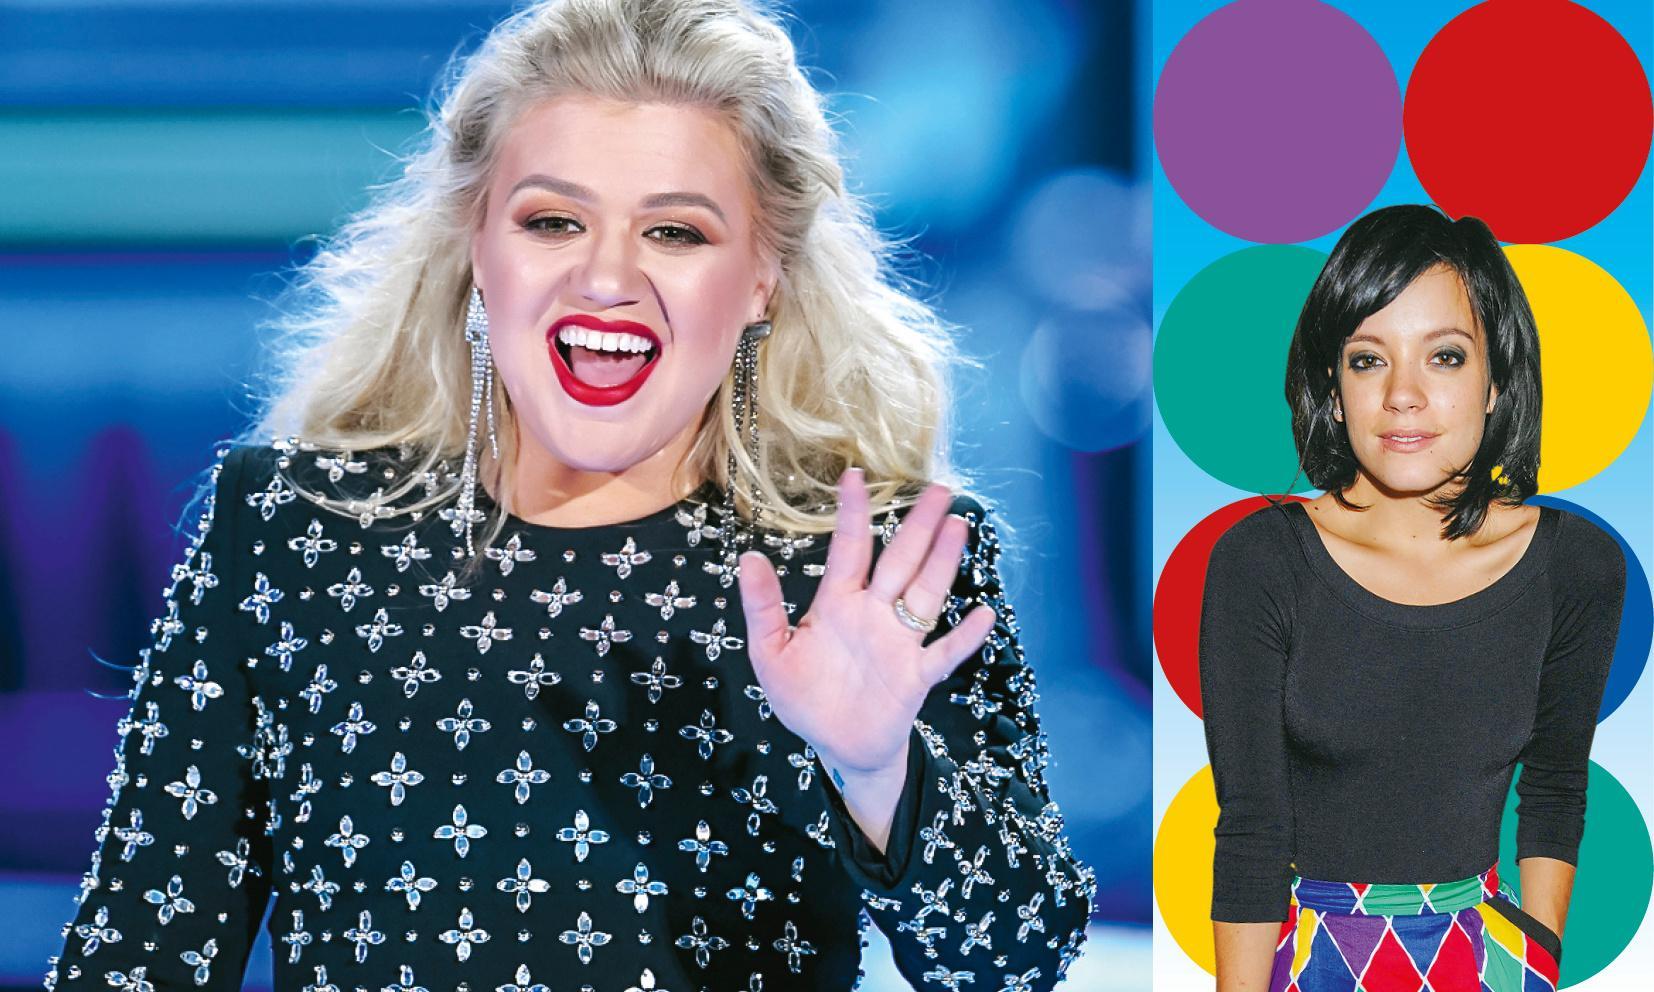 Since U been on: will Kelly Clarkson succeed as a talkshow host?